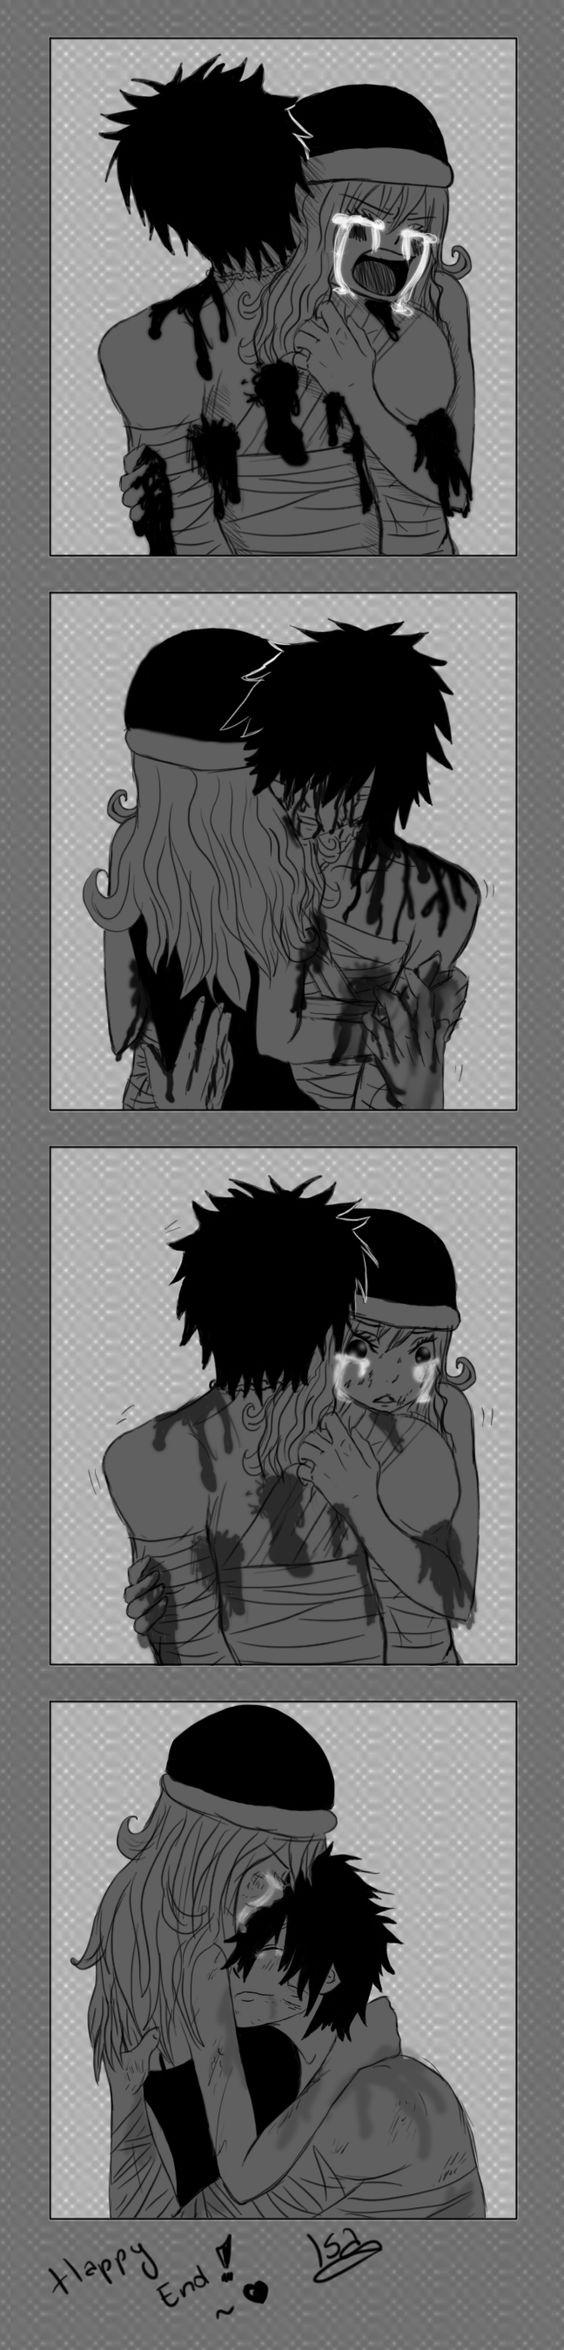 SHOUT TO AMY CHEN WHY jdhsveh ️ #GrayFullbuster   #JuviaLockser   #Fairytail #OTP #Anime #Cute #Funny #Feelings #Sexy #Hot #Canon #Anime #Heart #kawaii #couple #OTP #unisonraid #ship #UR #Gruvia